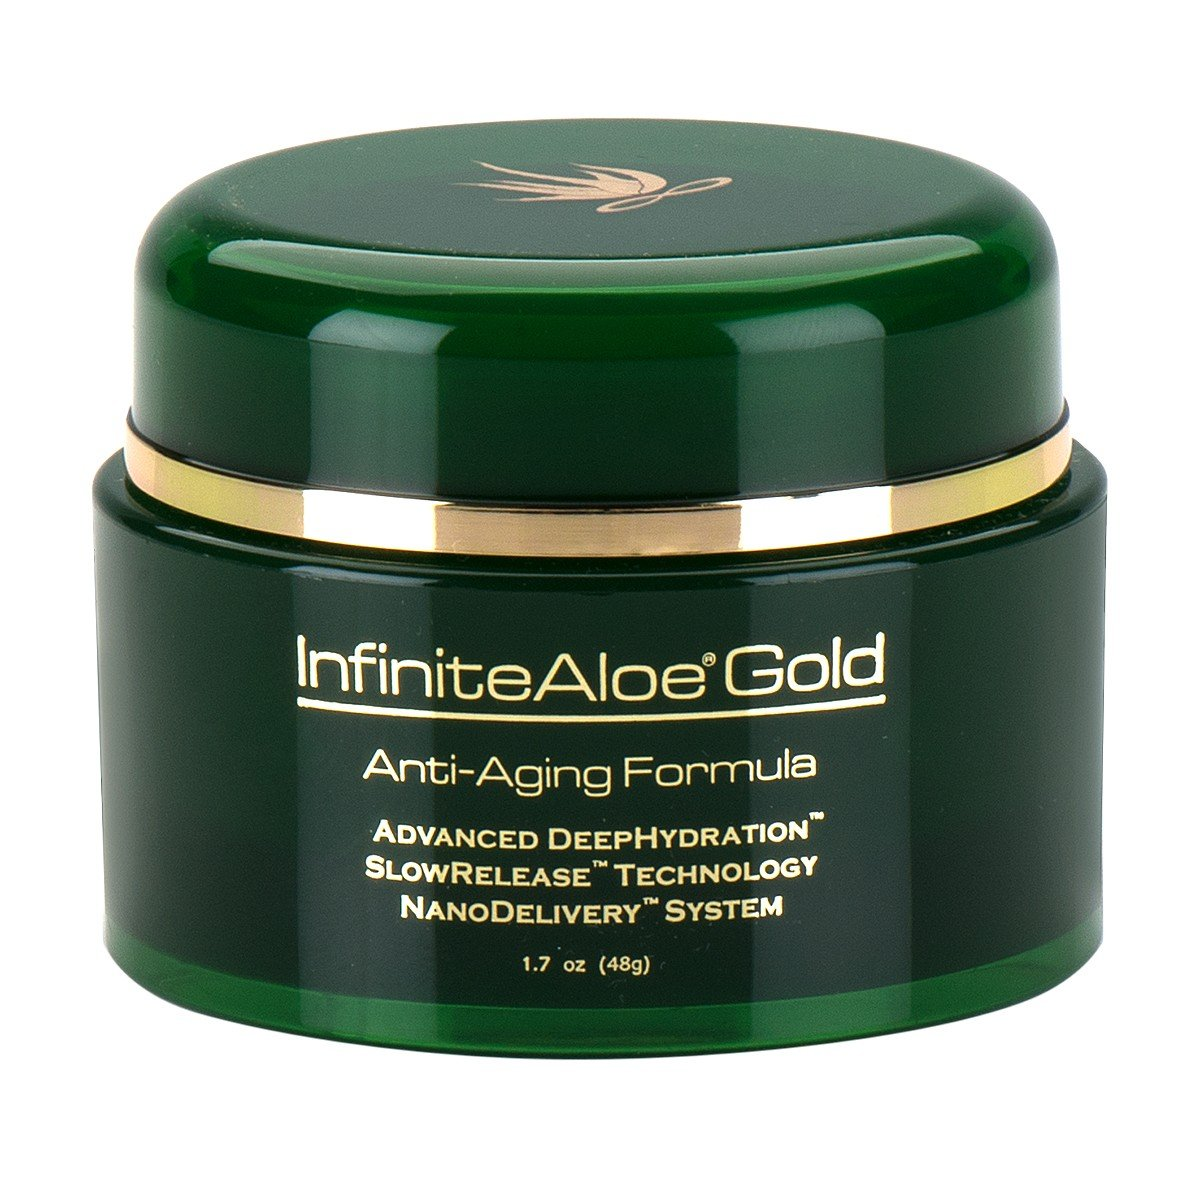 Infinite Aloe Gold Anti-Aging Formula 1.7 oz. Jar